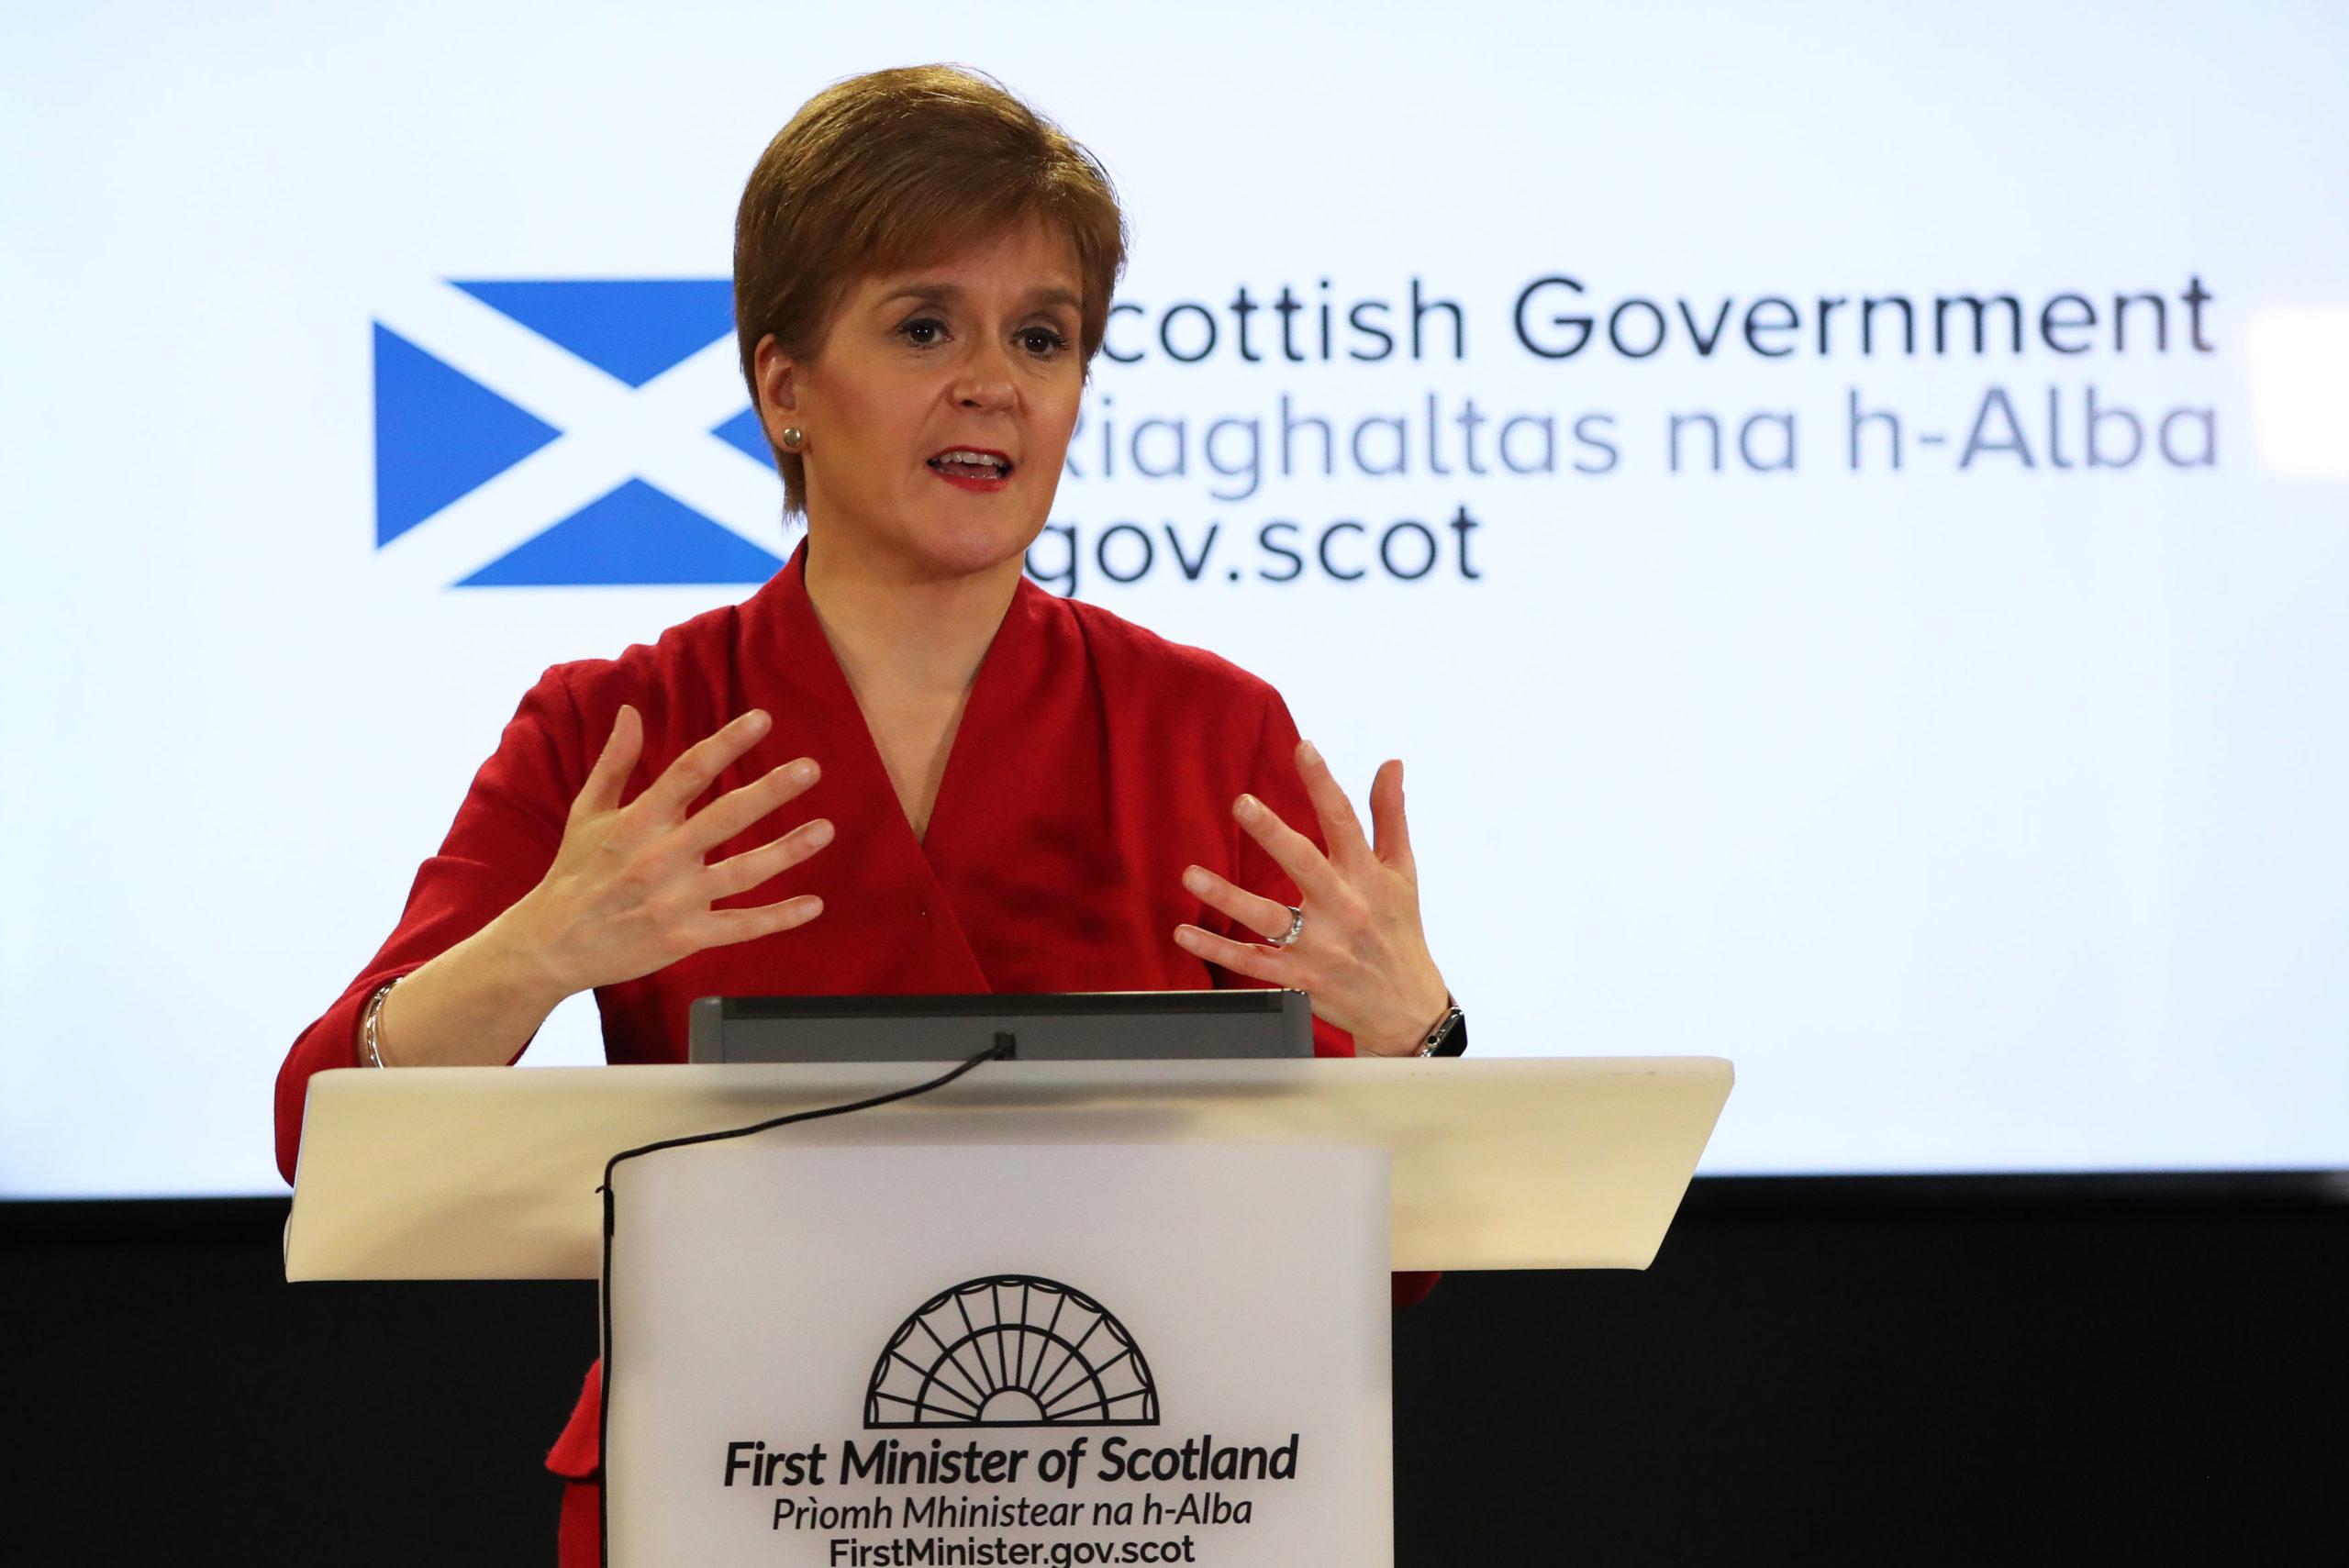 Scotland's First Minister Nicola Sturgeon speaking during a briefing on coronavirus in Edinburgh.